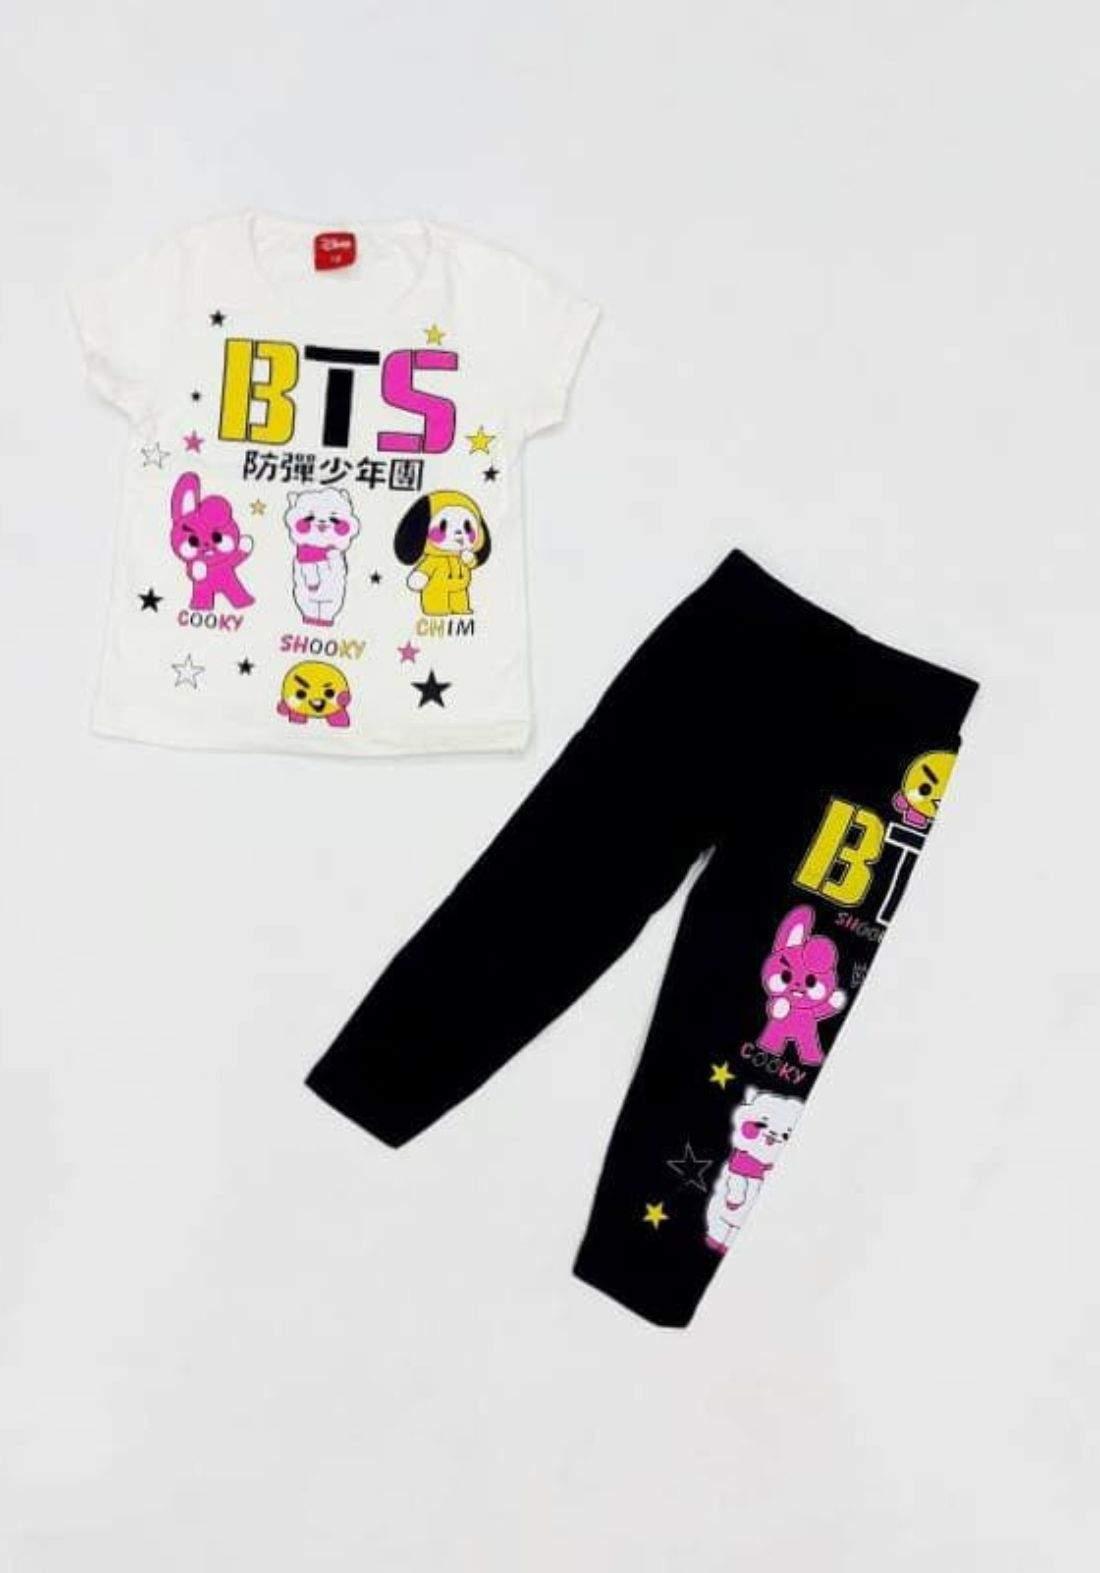 Tracksuit for girls white  (t-shirt+pijamas) تراكسوت بناتي ابيض (بجامة+تيشيرت)